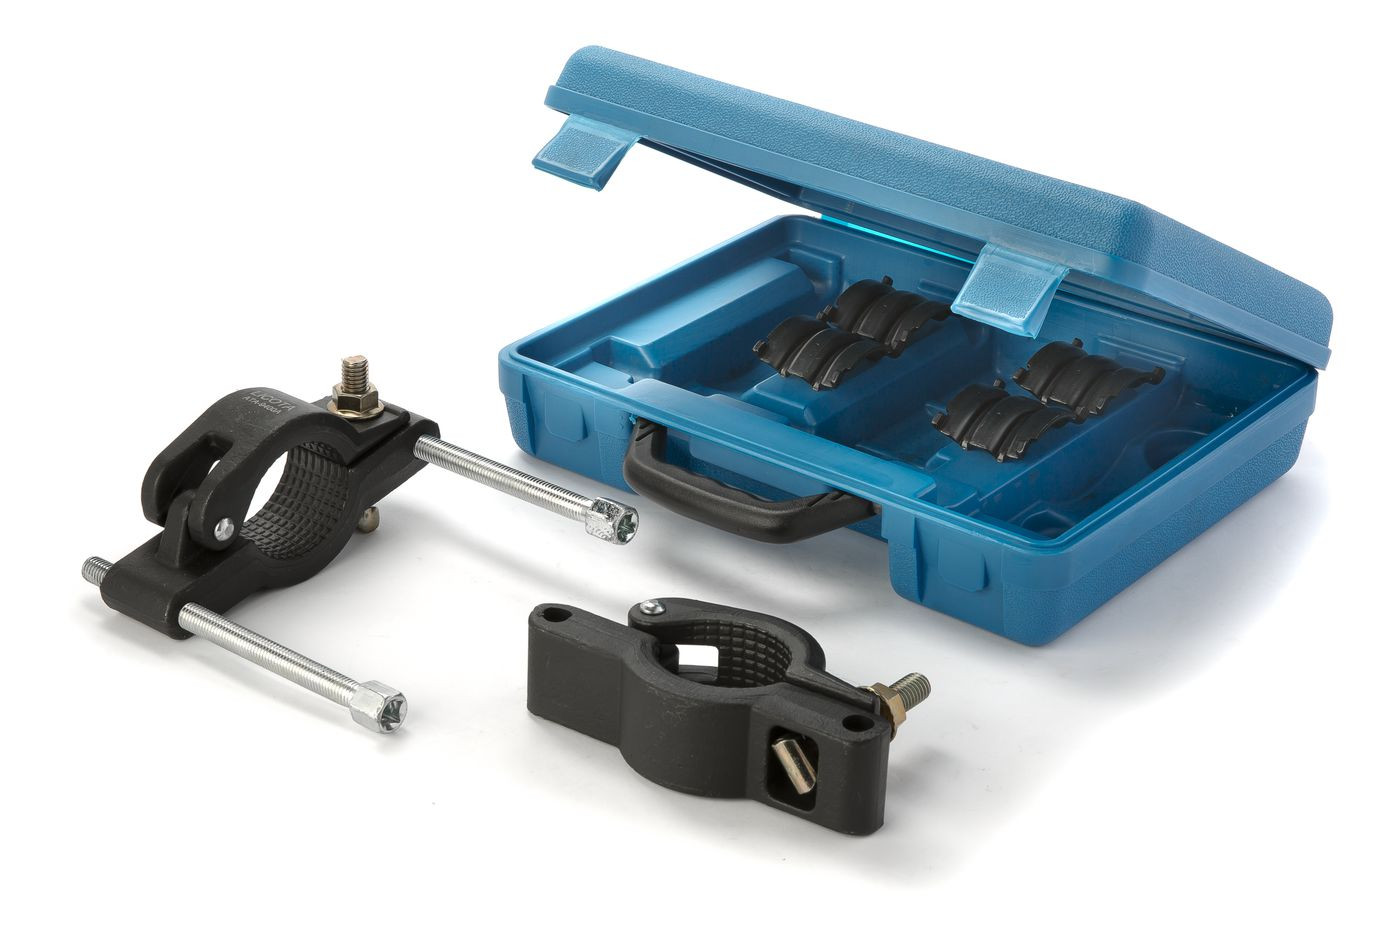 Separation tool